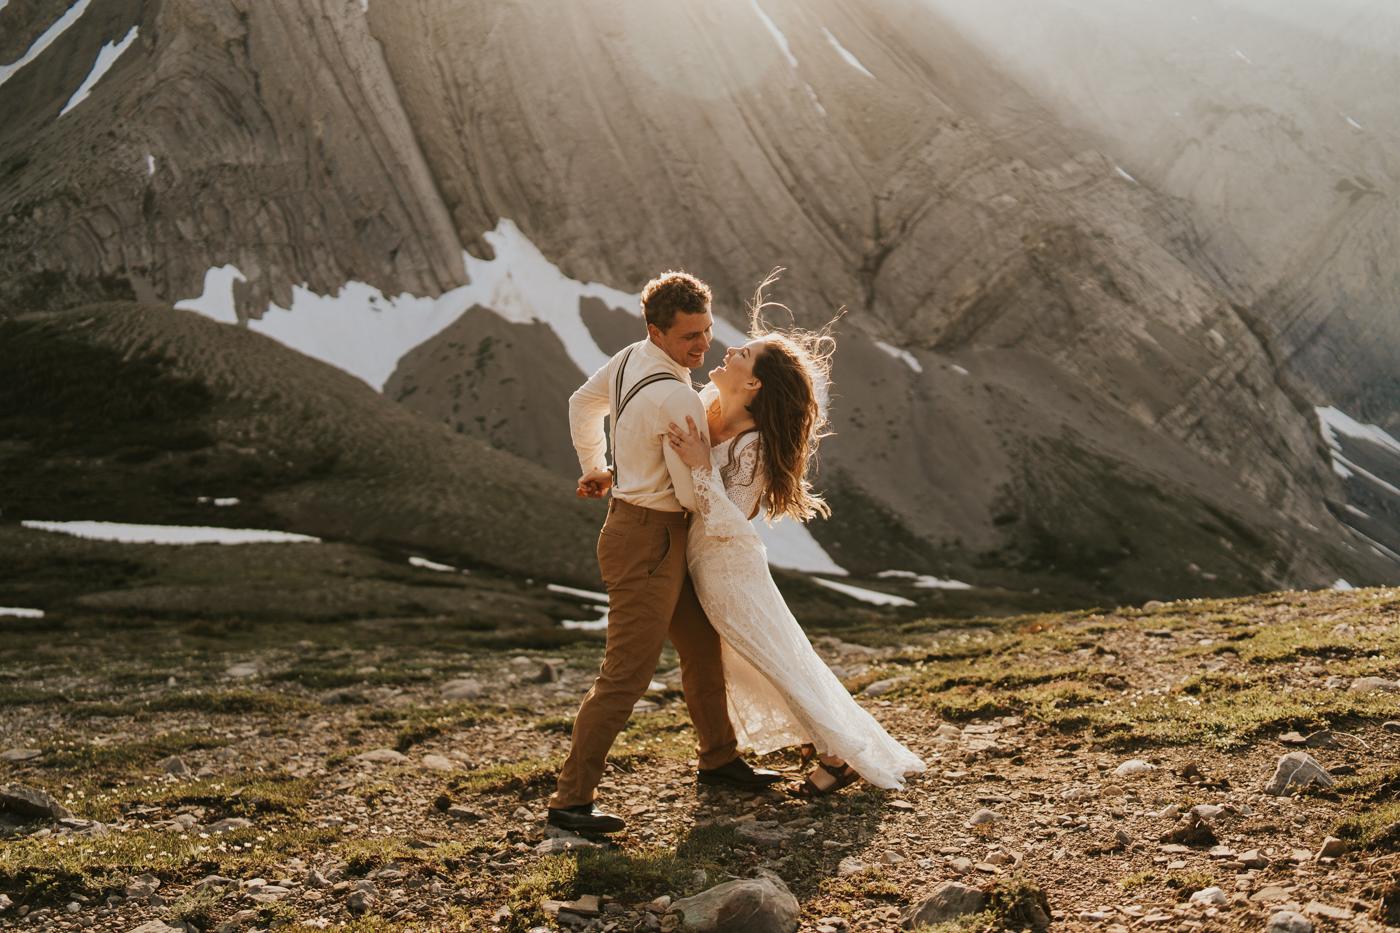 tyraephotography_photographer_wedding_elopement_engagement_photography-08314.jpg